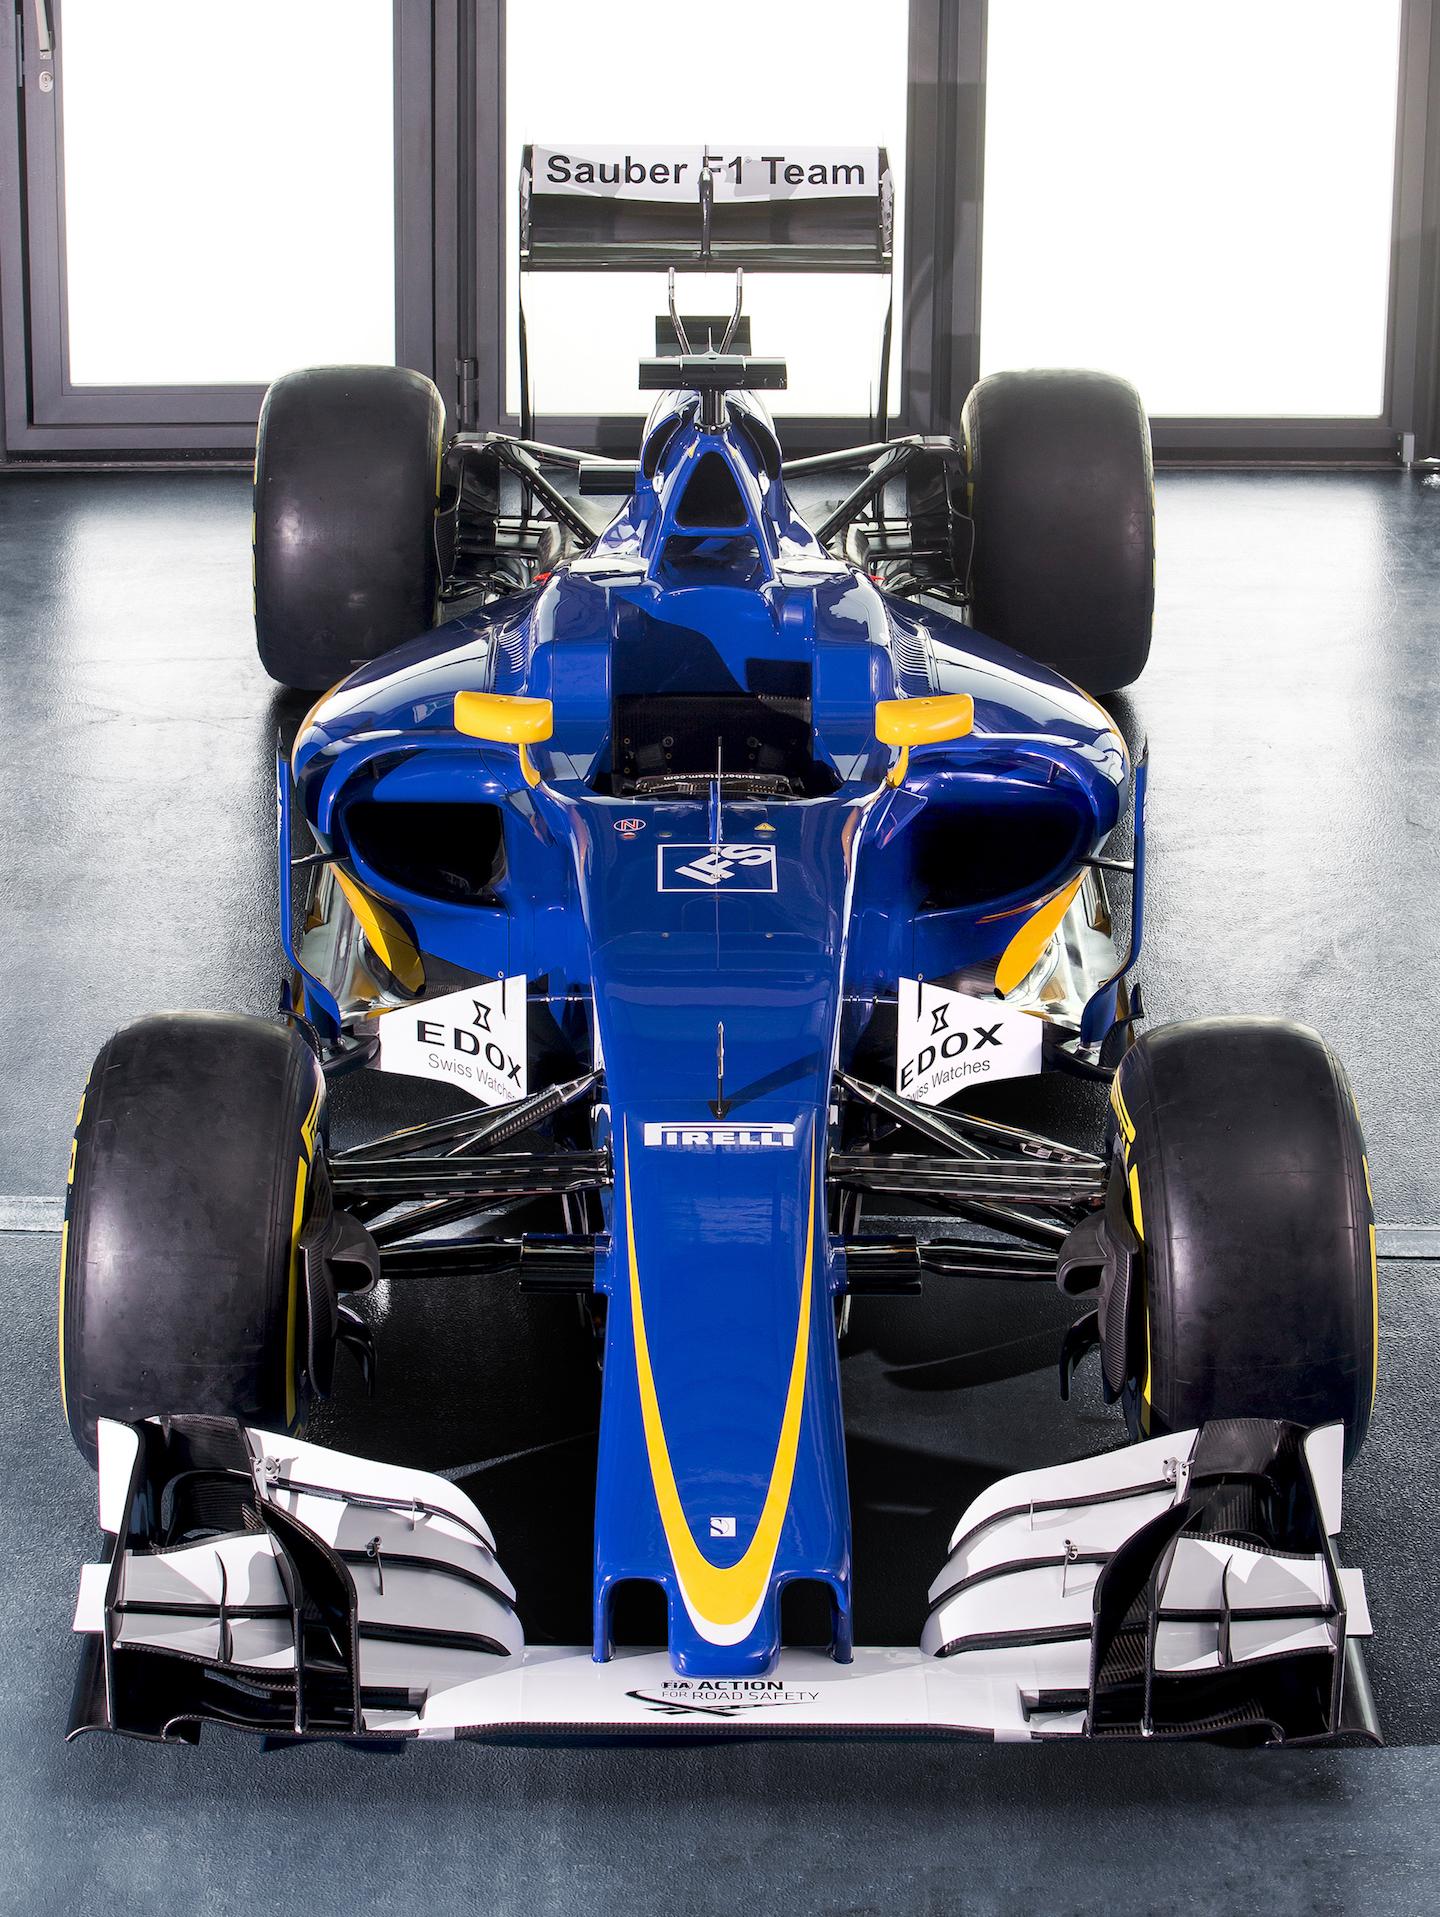 SauberC35-Ferrari_FrontHighest_300dpi_01 copy.jpg